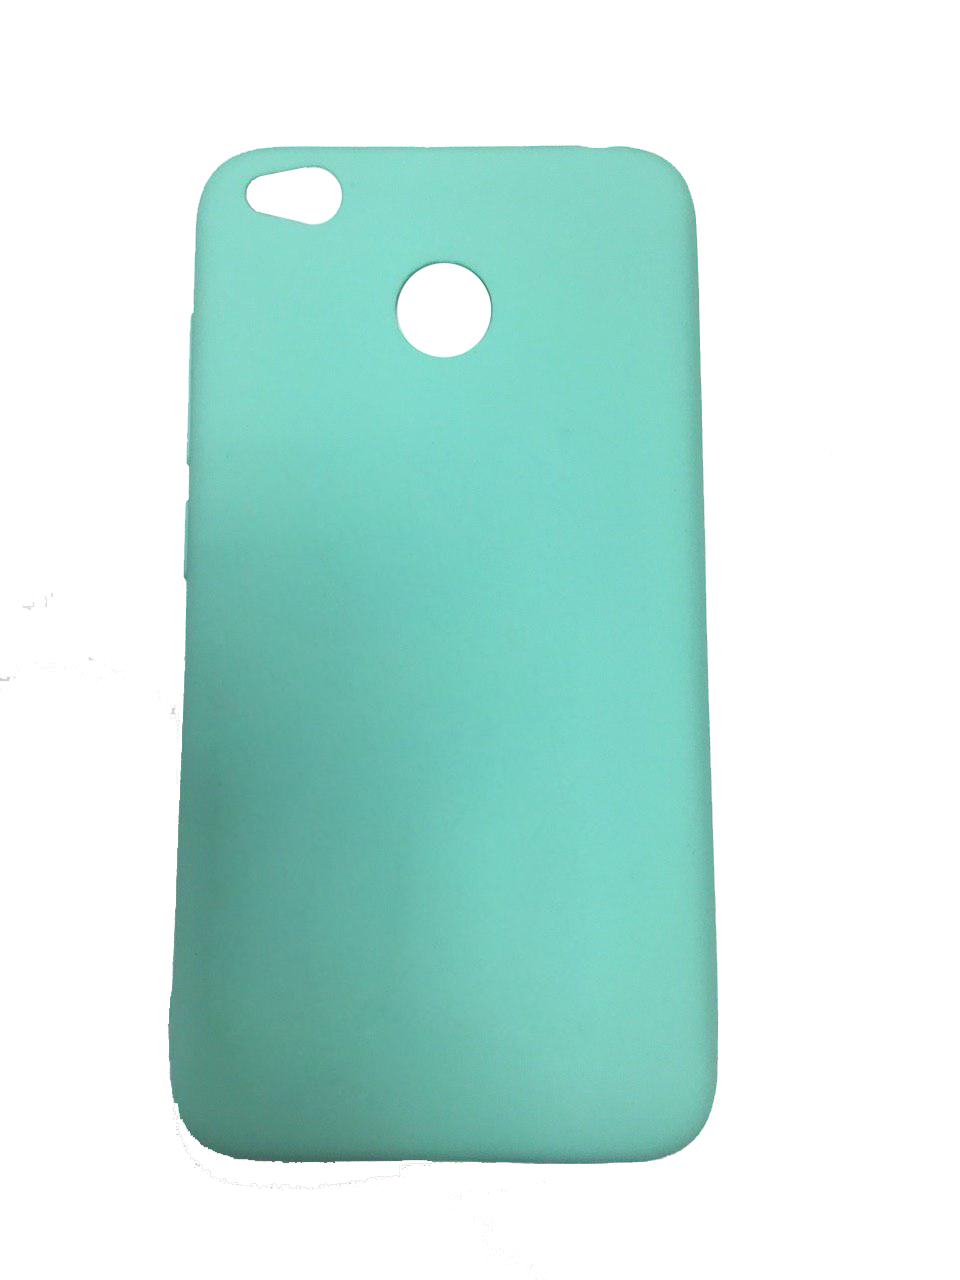 Чехол для Xiaomi Redmi 4A Чехол для Xiaomi Redmi 4A (Бирюзовый)